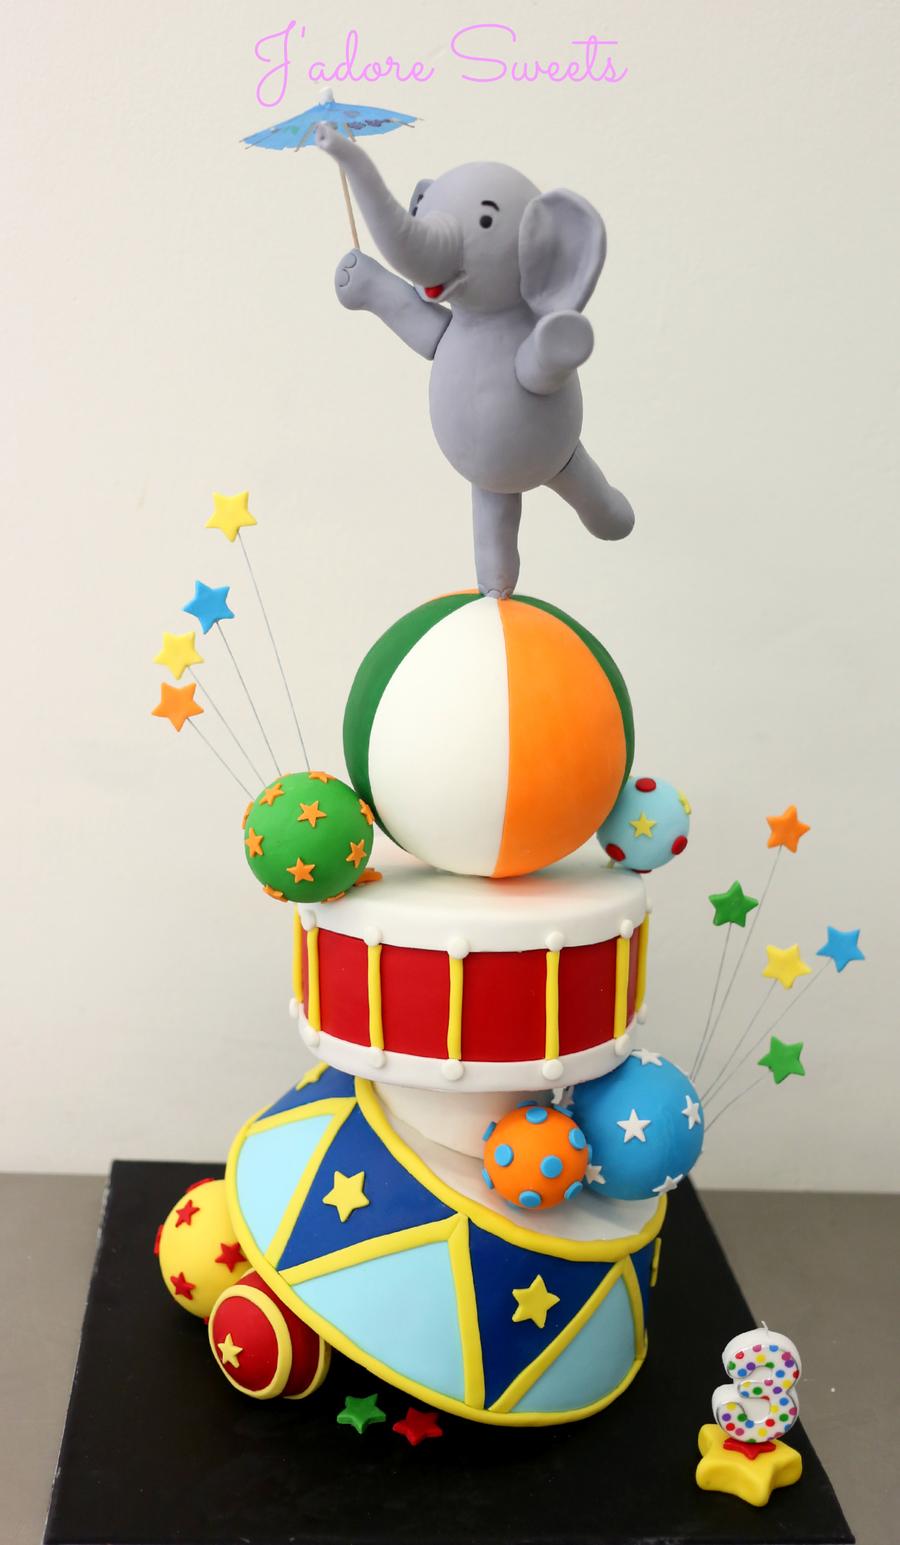 Topsy Turvy Circus Cake